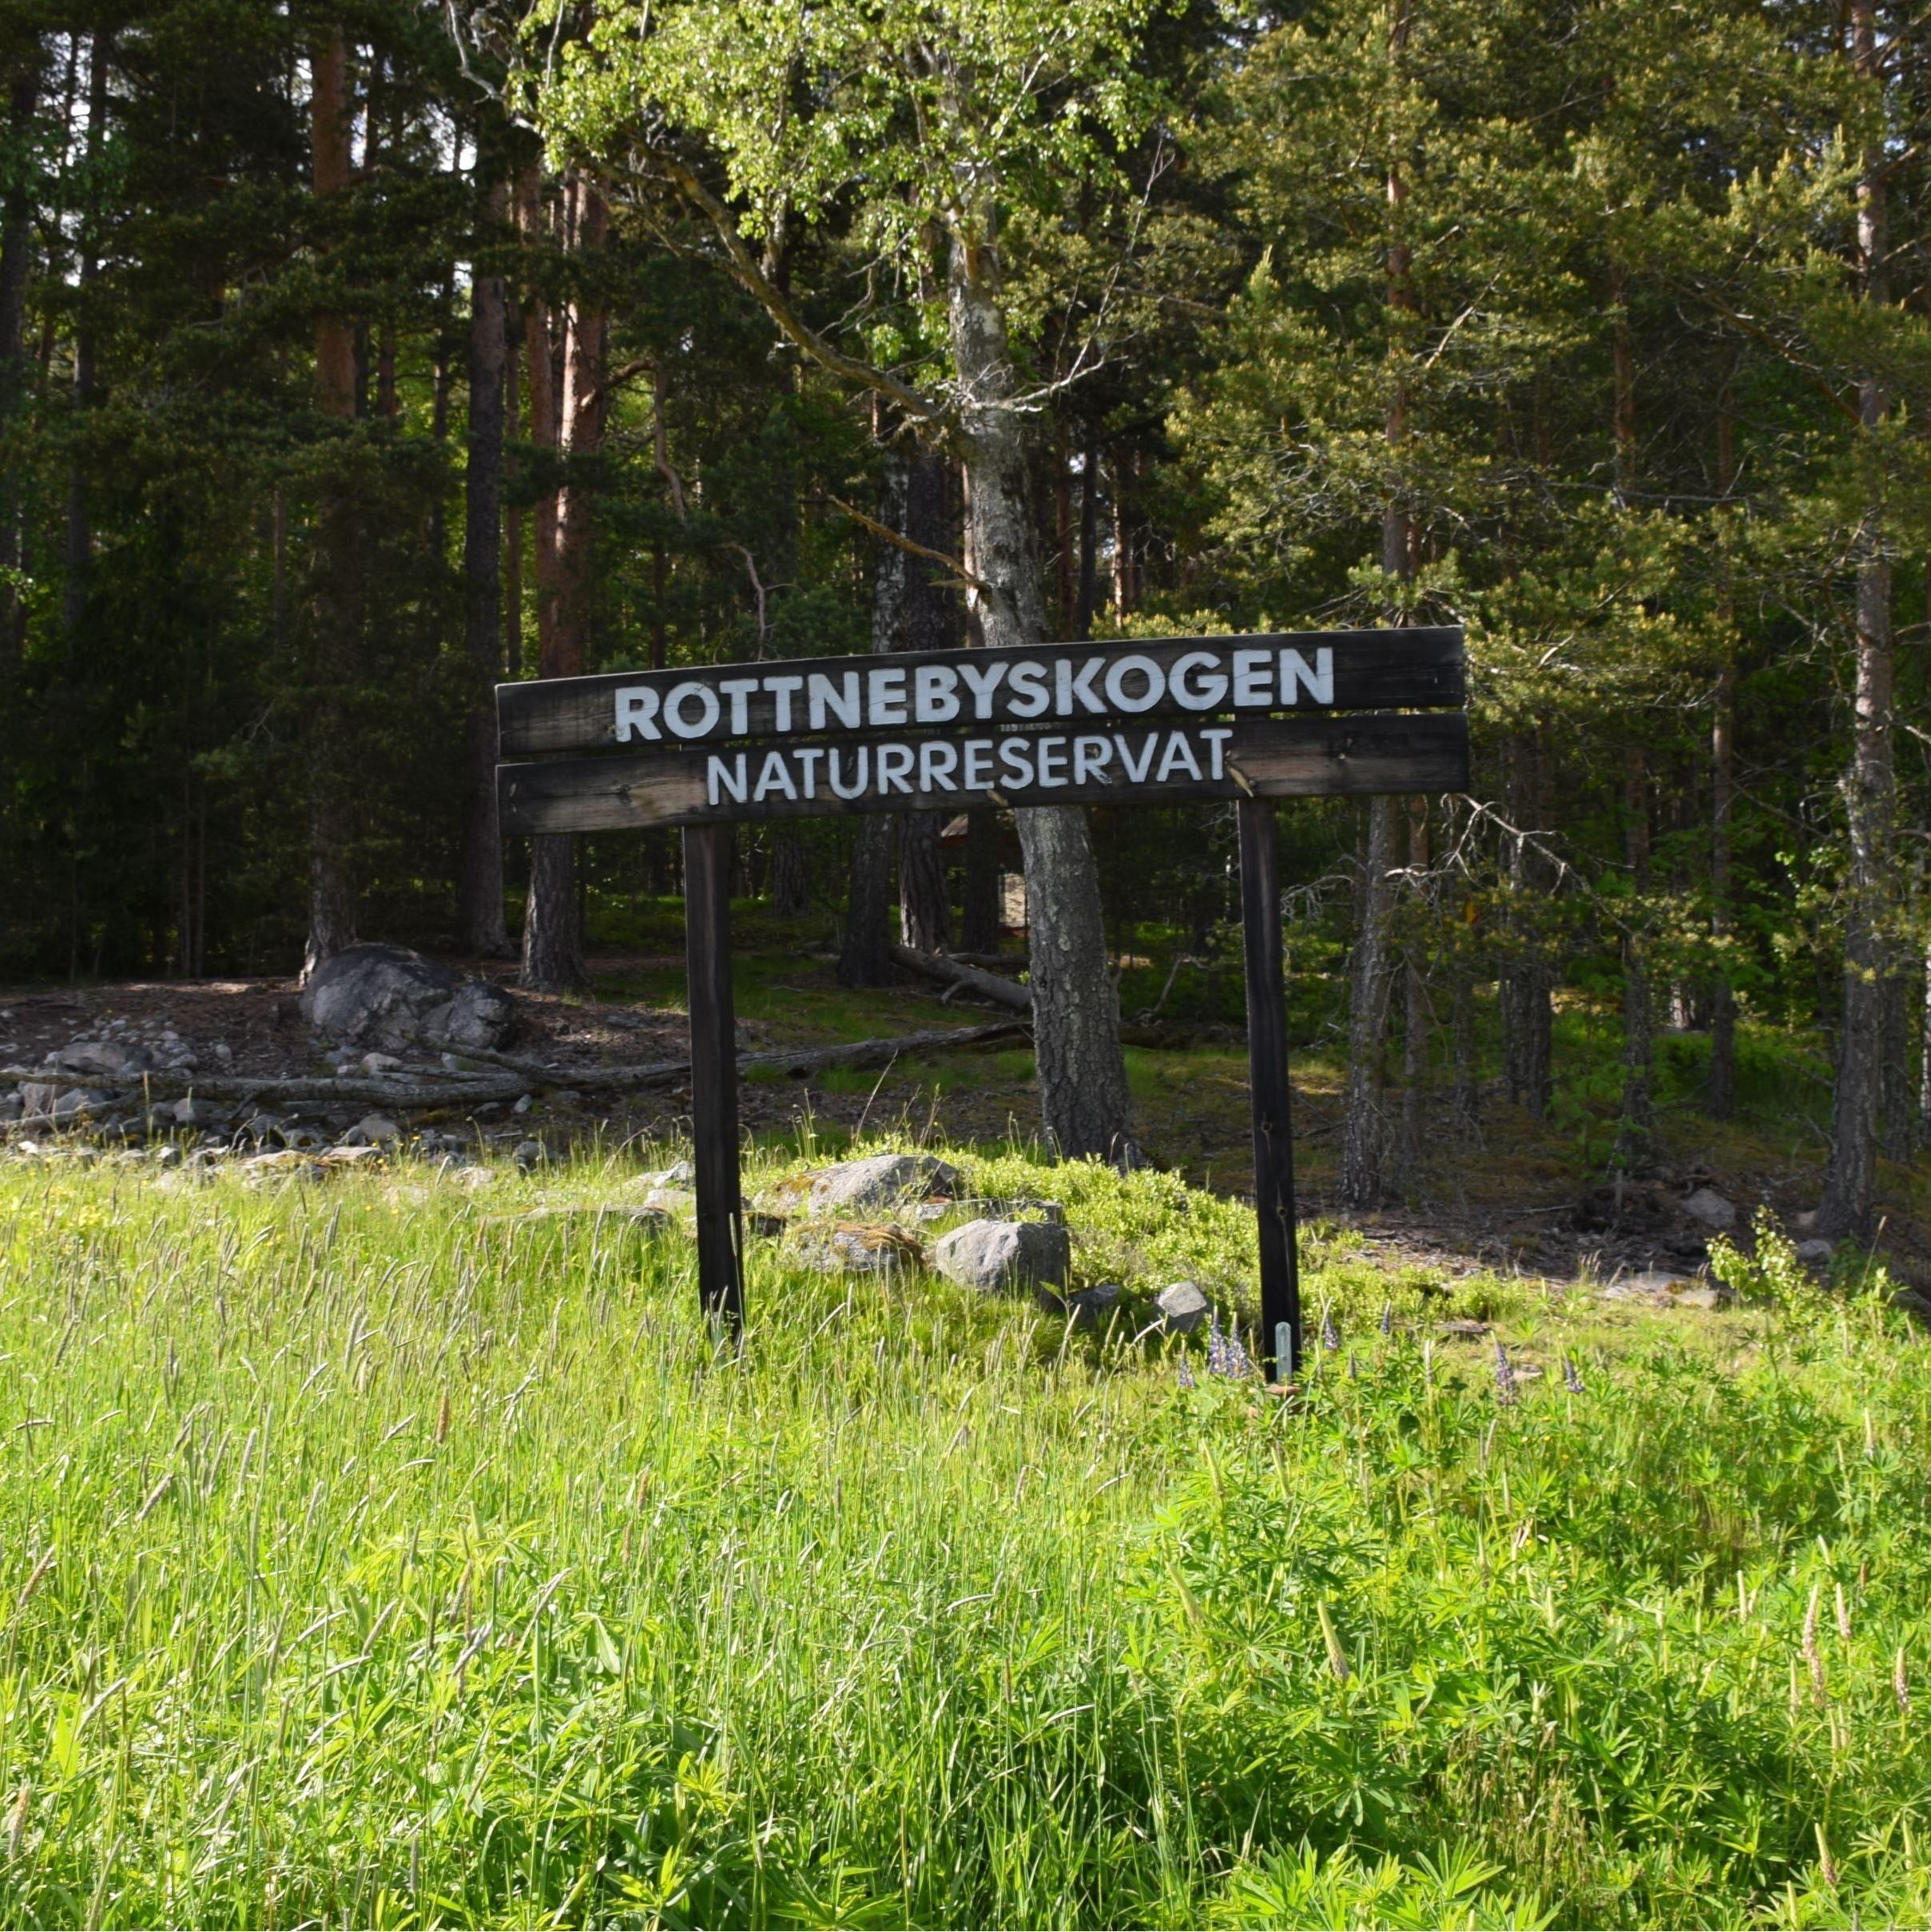 Mattias Boman, Rottnebyskogen Nature Reserve